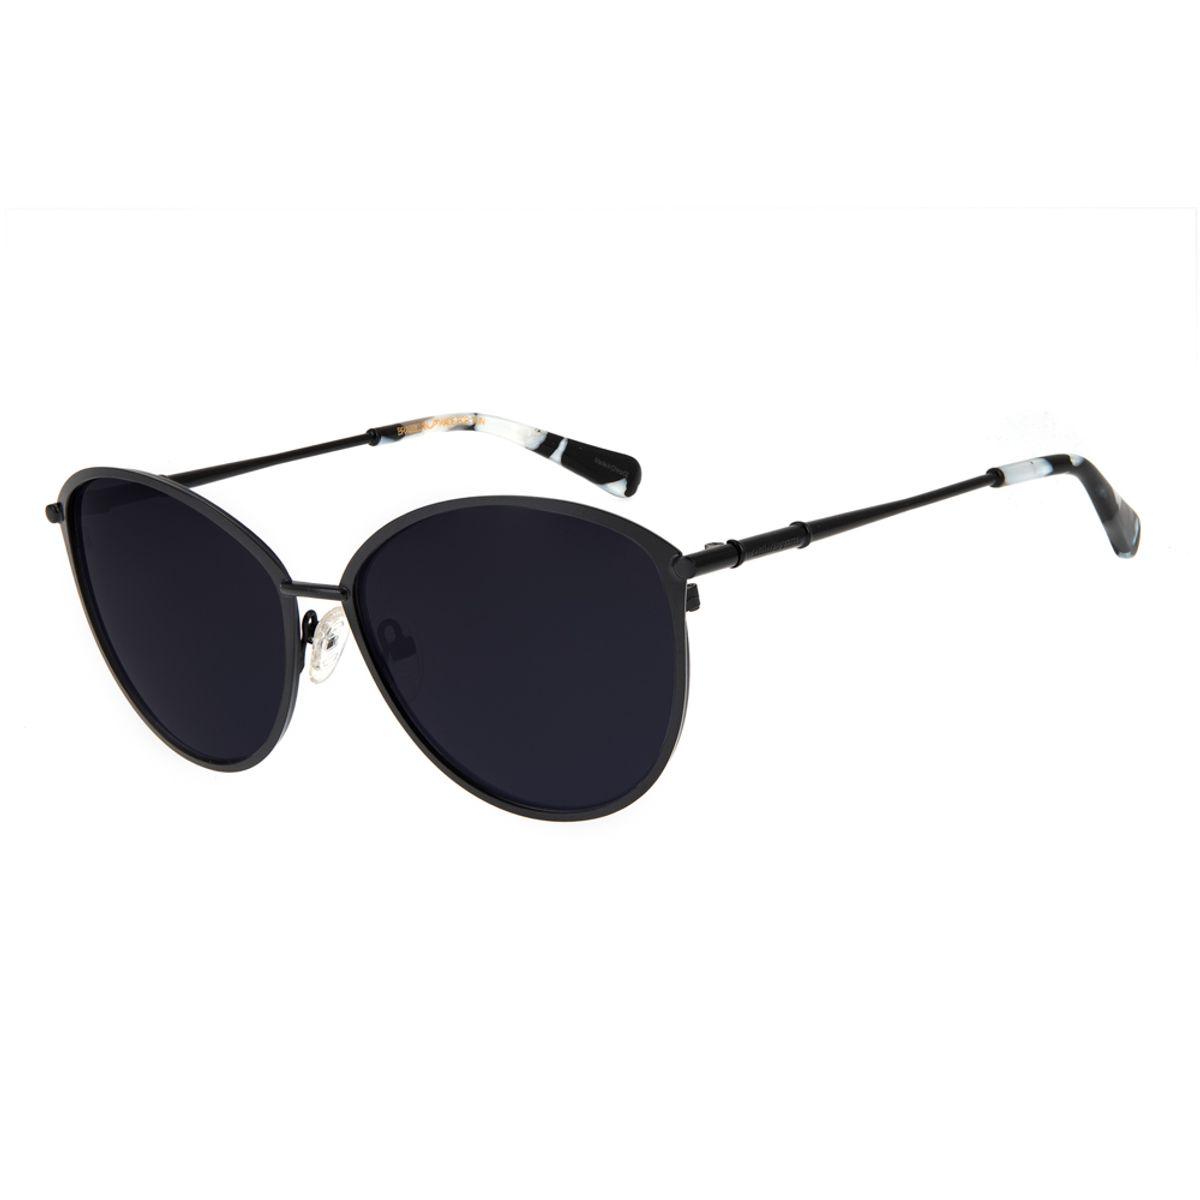 0106ddef2a4c6 Óculos de Sol Chilli Beans Feminino Gatinho Metal Preto 2607 ...